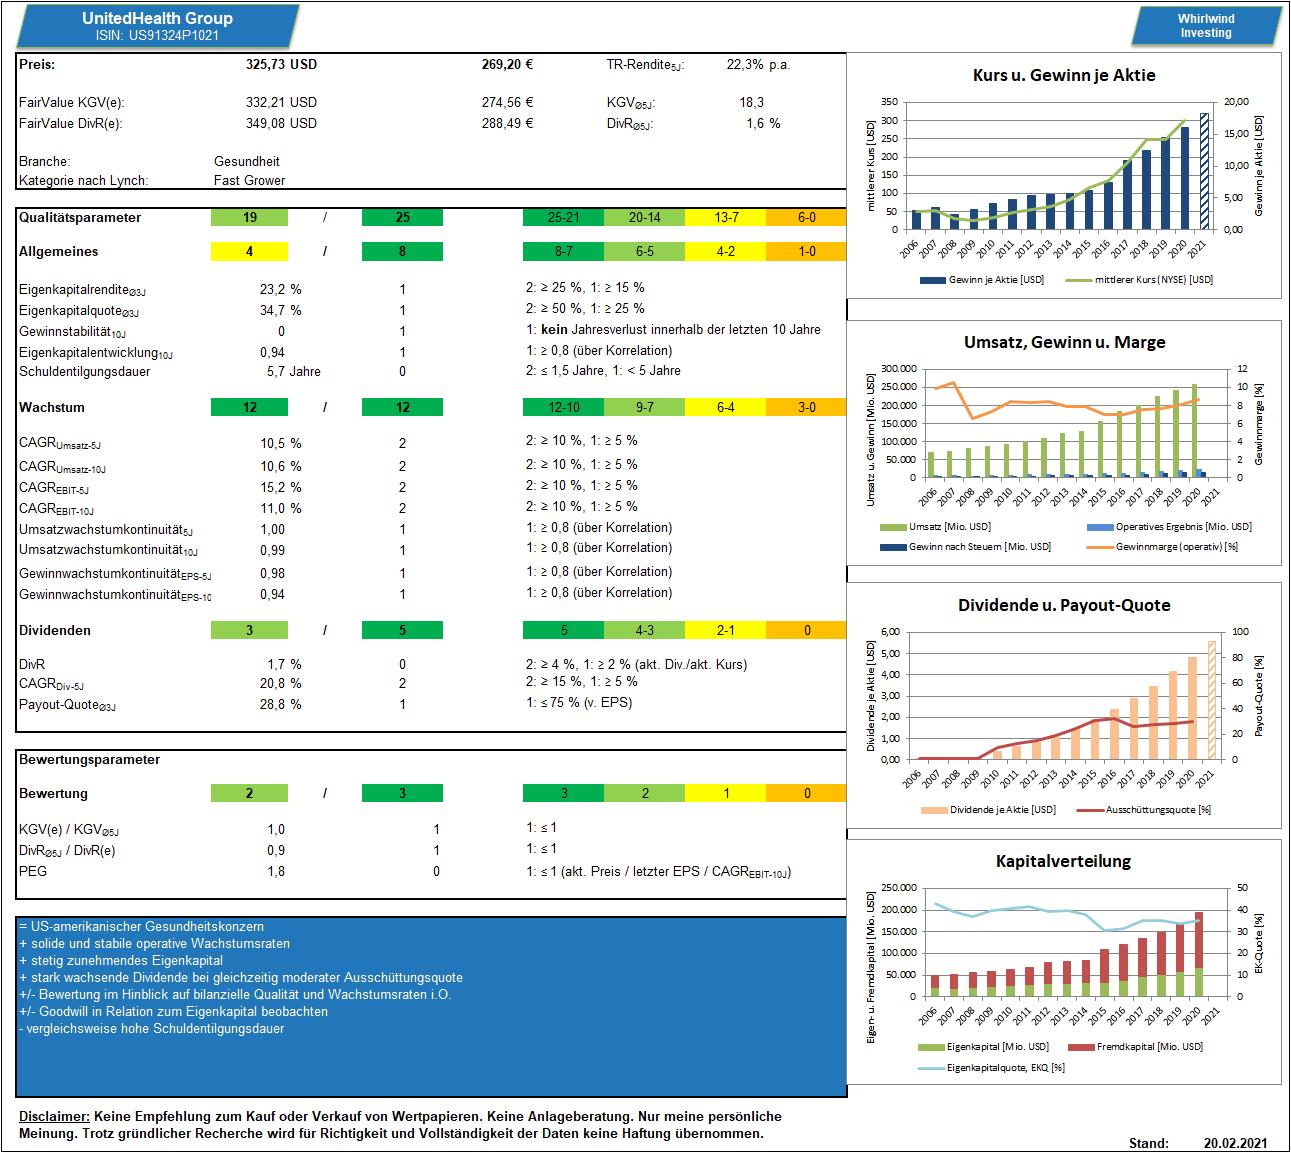 Dashboard zur UnitedHealth Group - Whirlwind-Investing